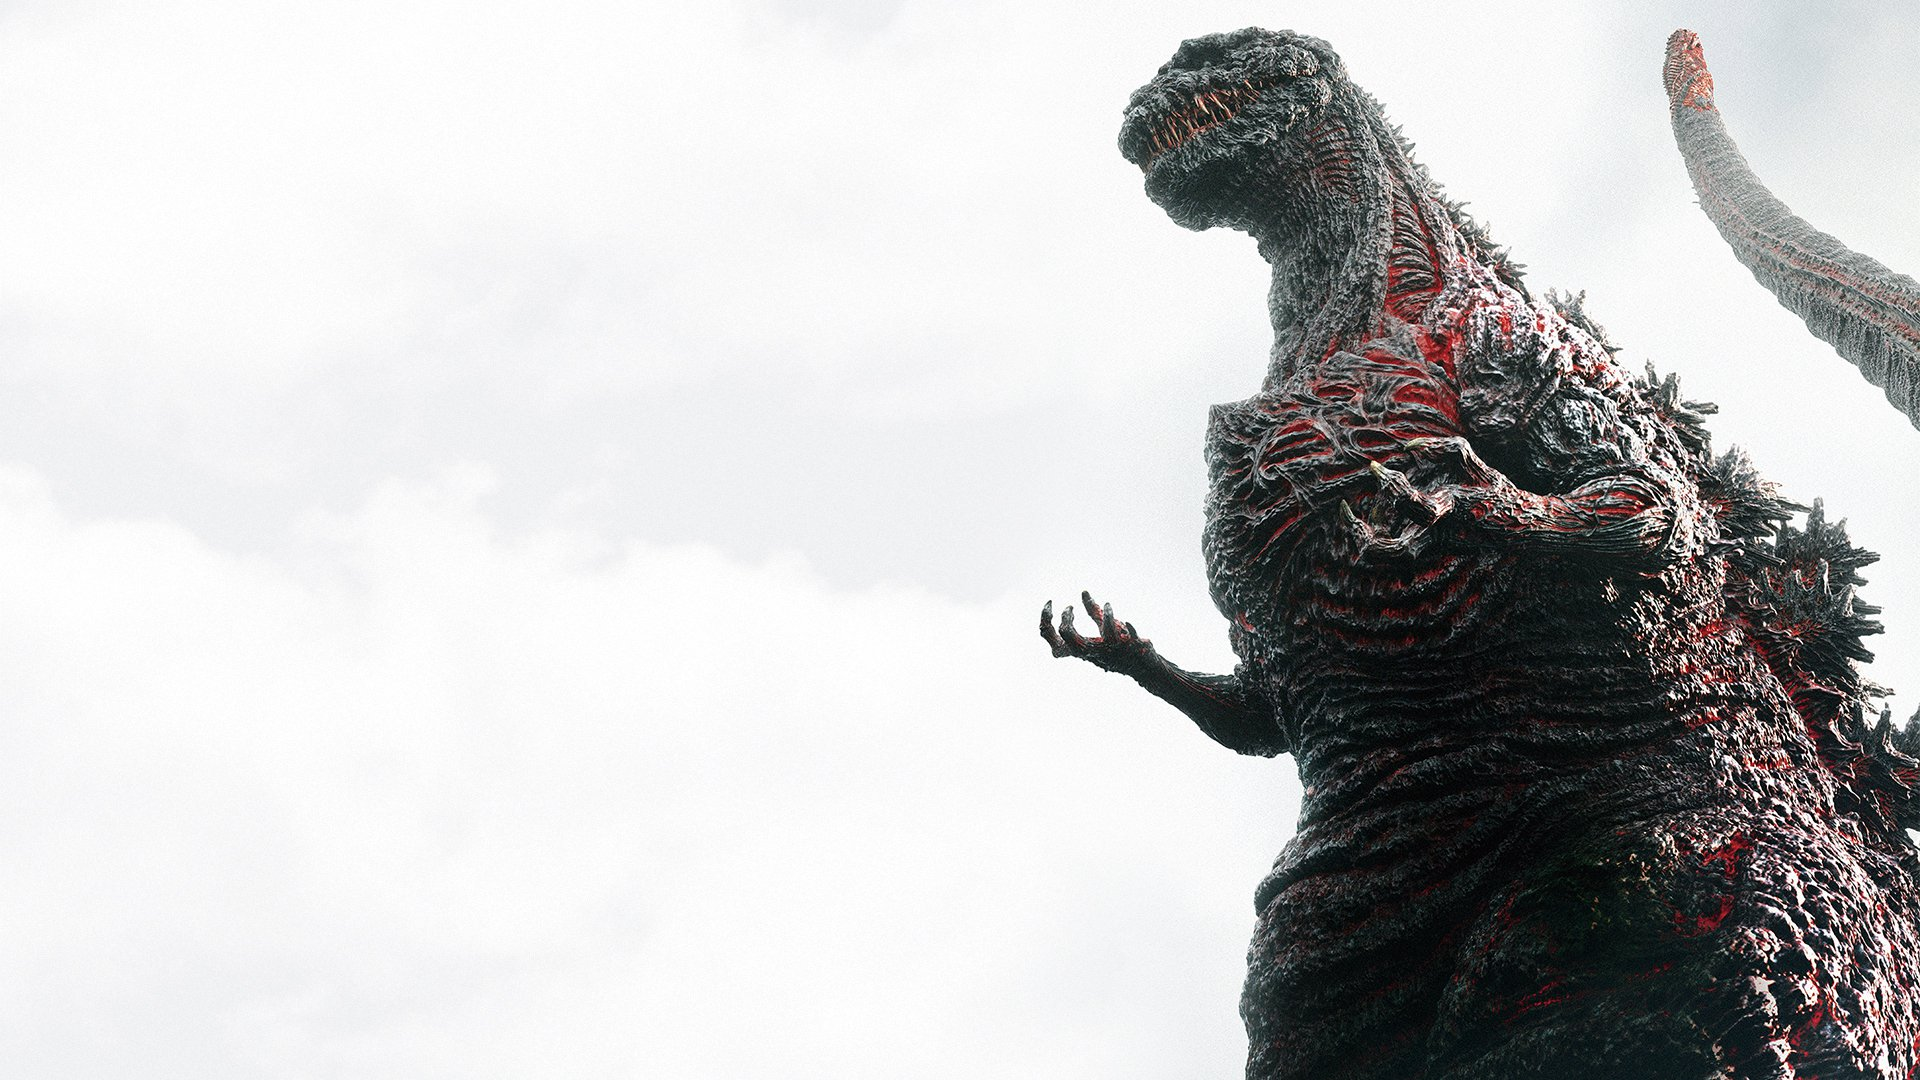 Official Godzilla Resurgence HD Wallpaper   Godzilla Resurgence Shin 1920x1080